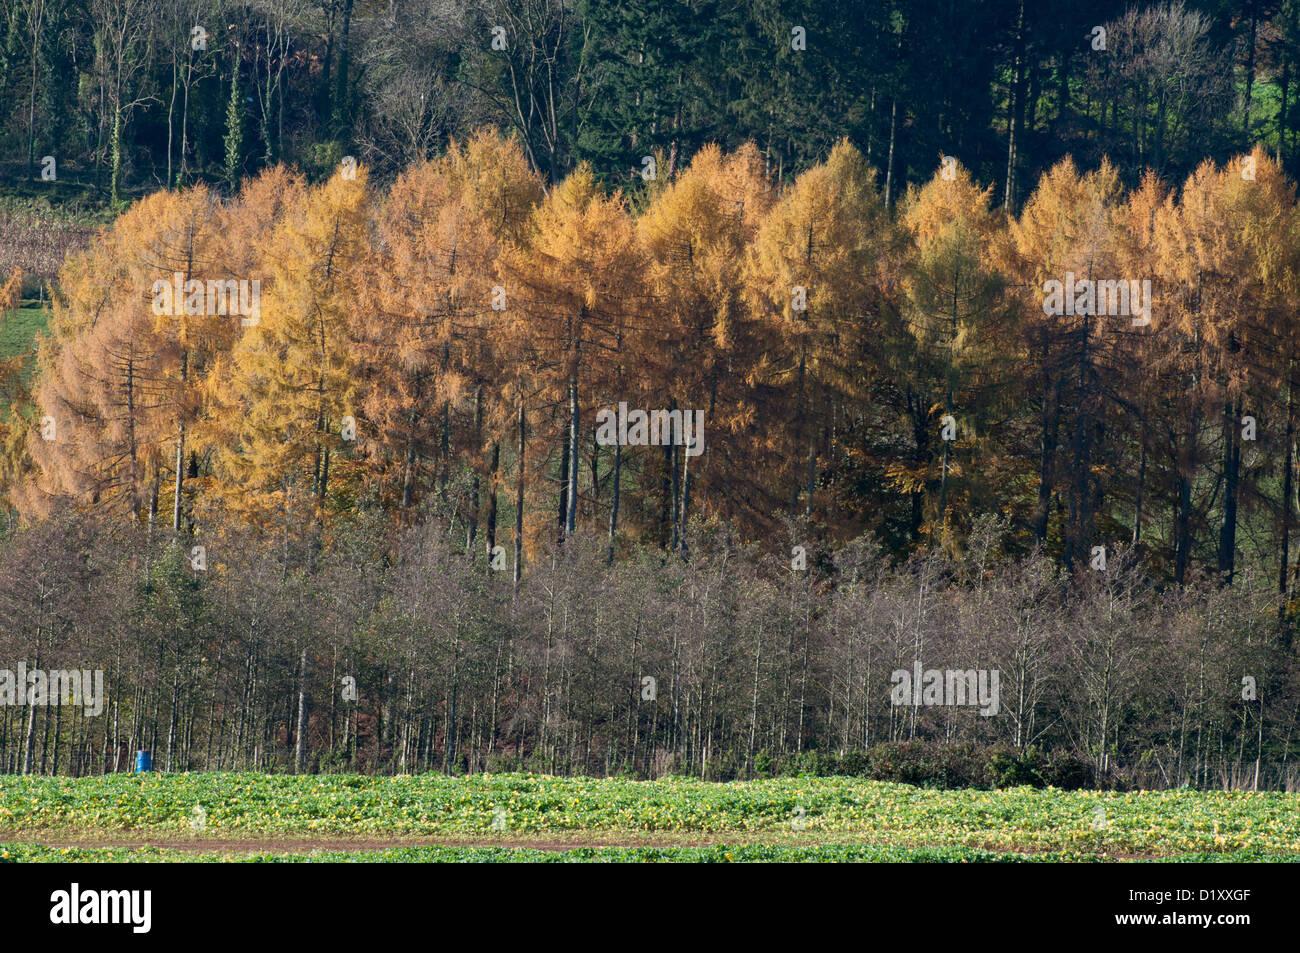 autumnal landscape, edge of forest, conifer trees, autumn colours, sapplings, crops - Stock Image